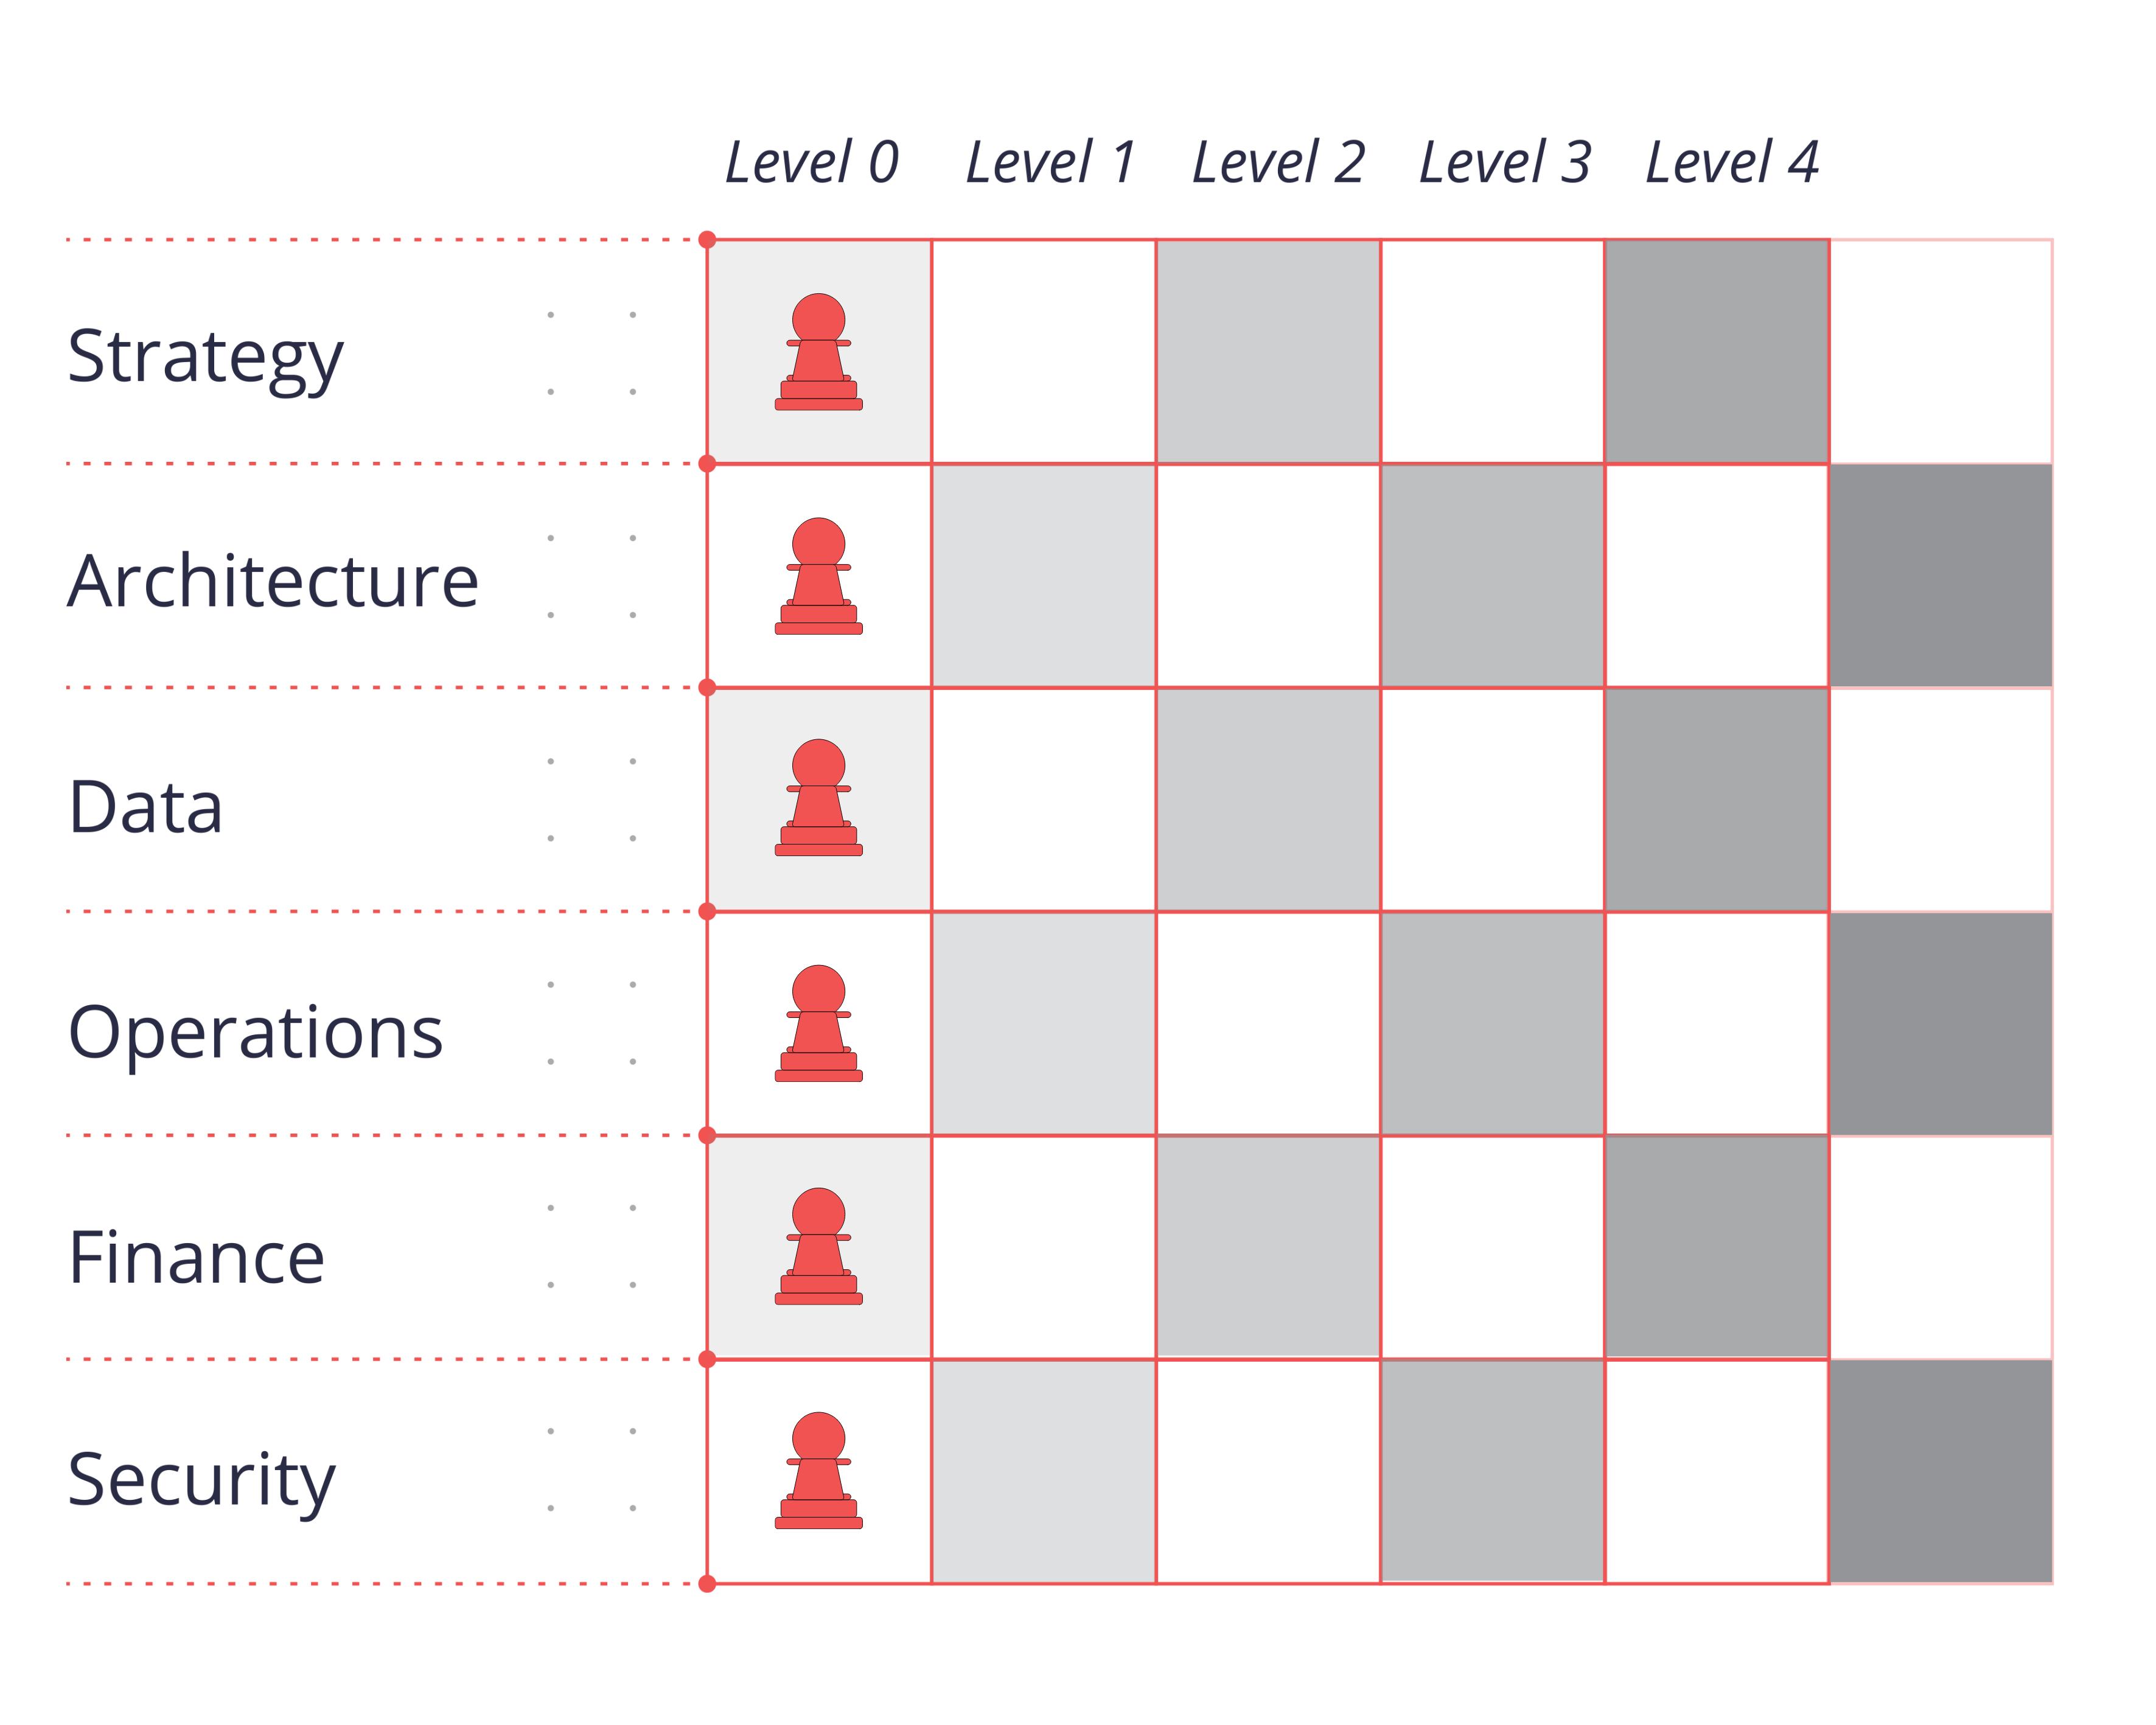 impACT grid chessboard